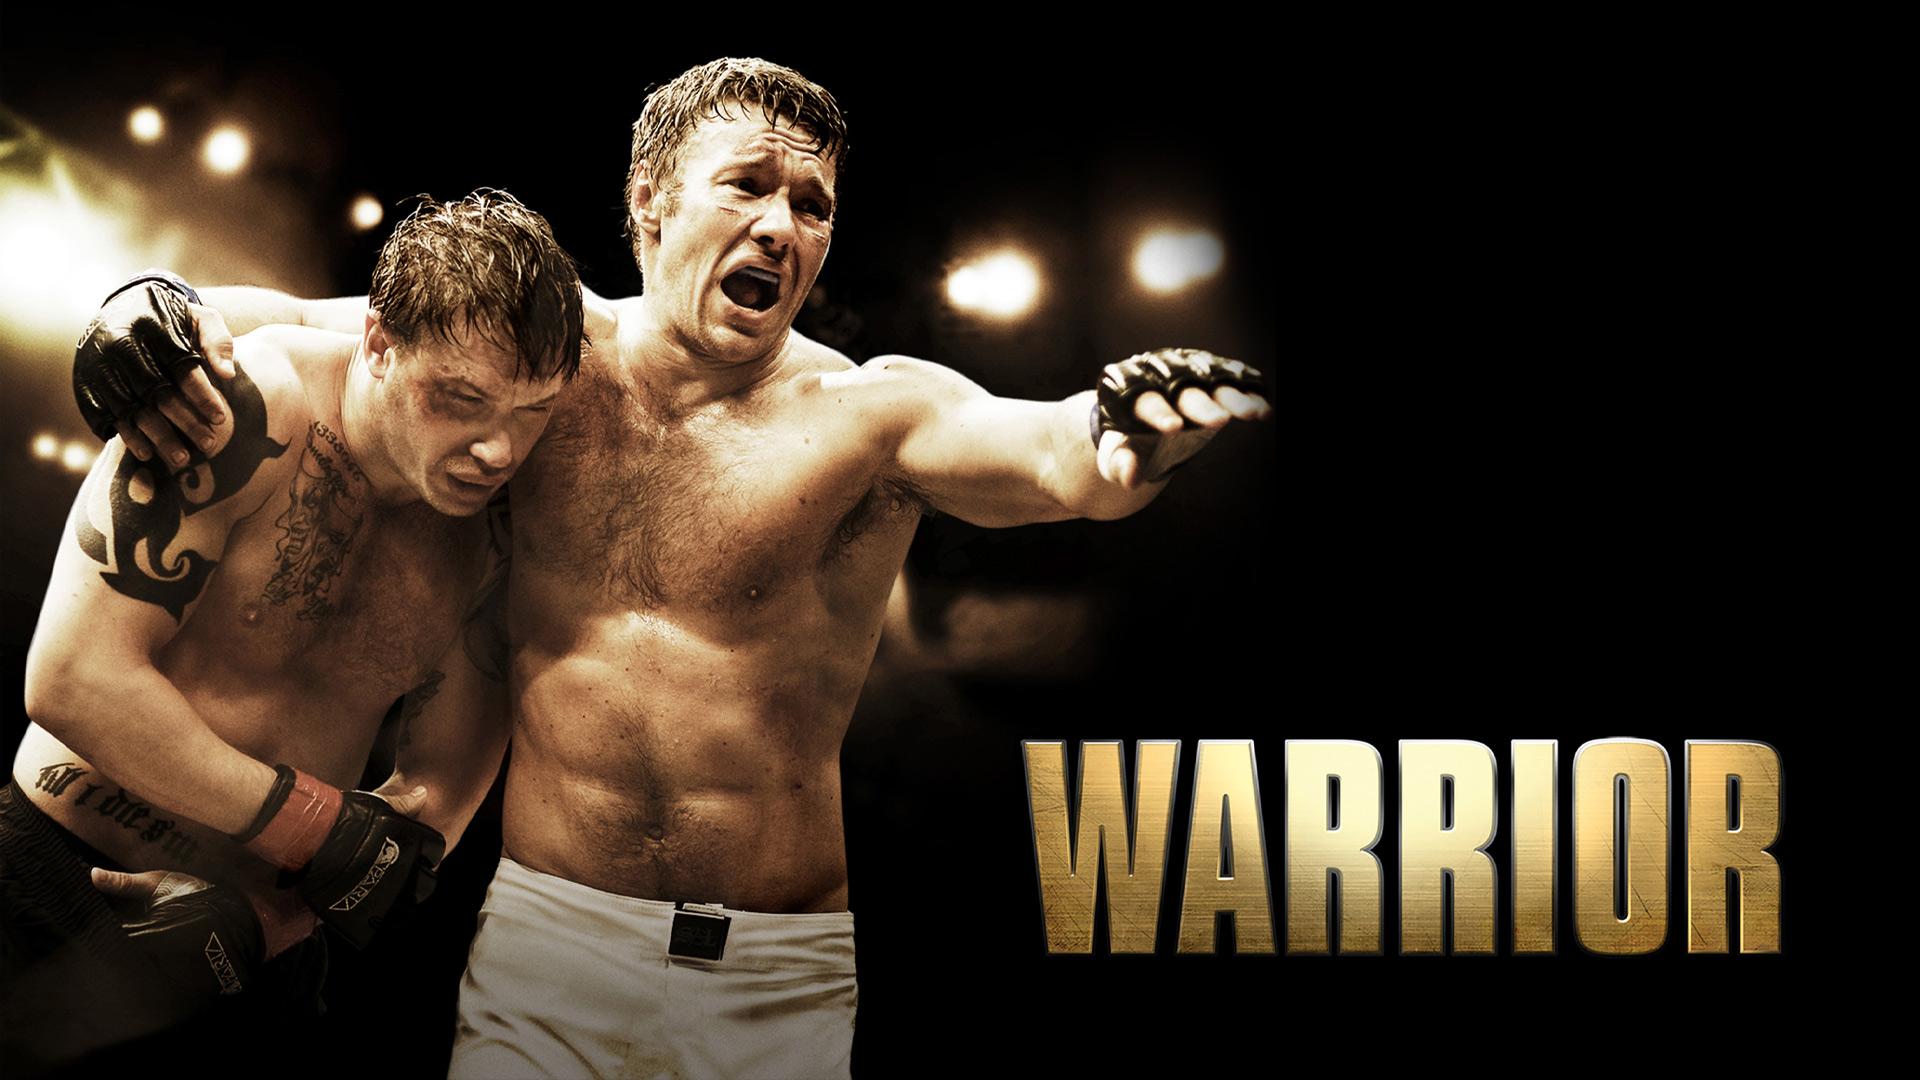 Warrior (4K UHD)